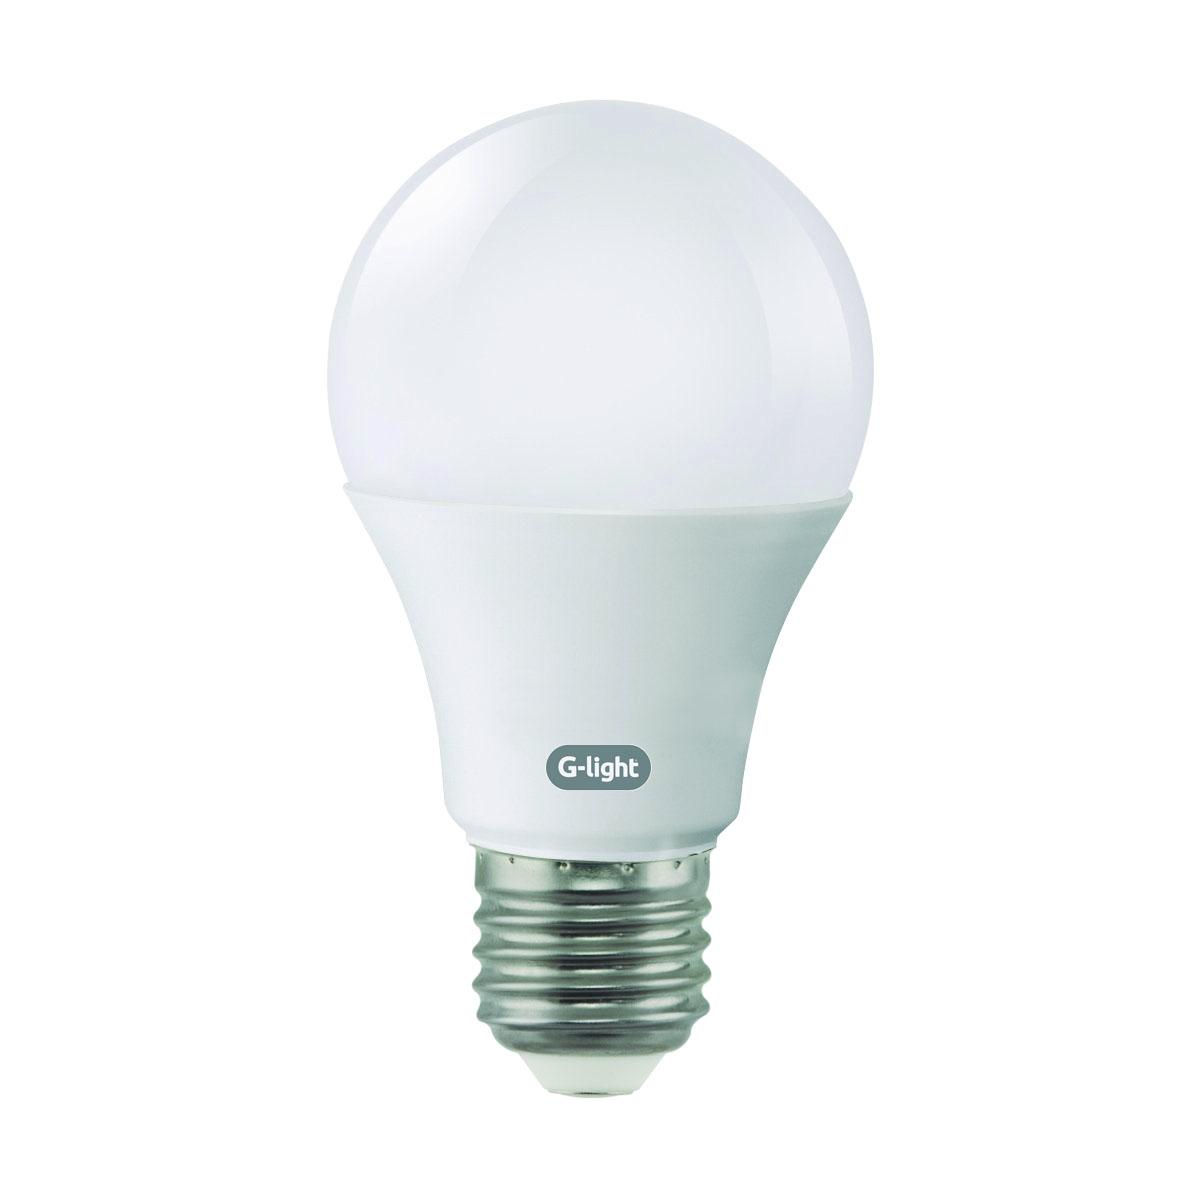 lampada led bulbo g light a60 6 5w 6500k 100 240v judy cabos. Black Bedroom Furniture Sets. Home Design Ideas